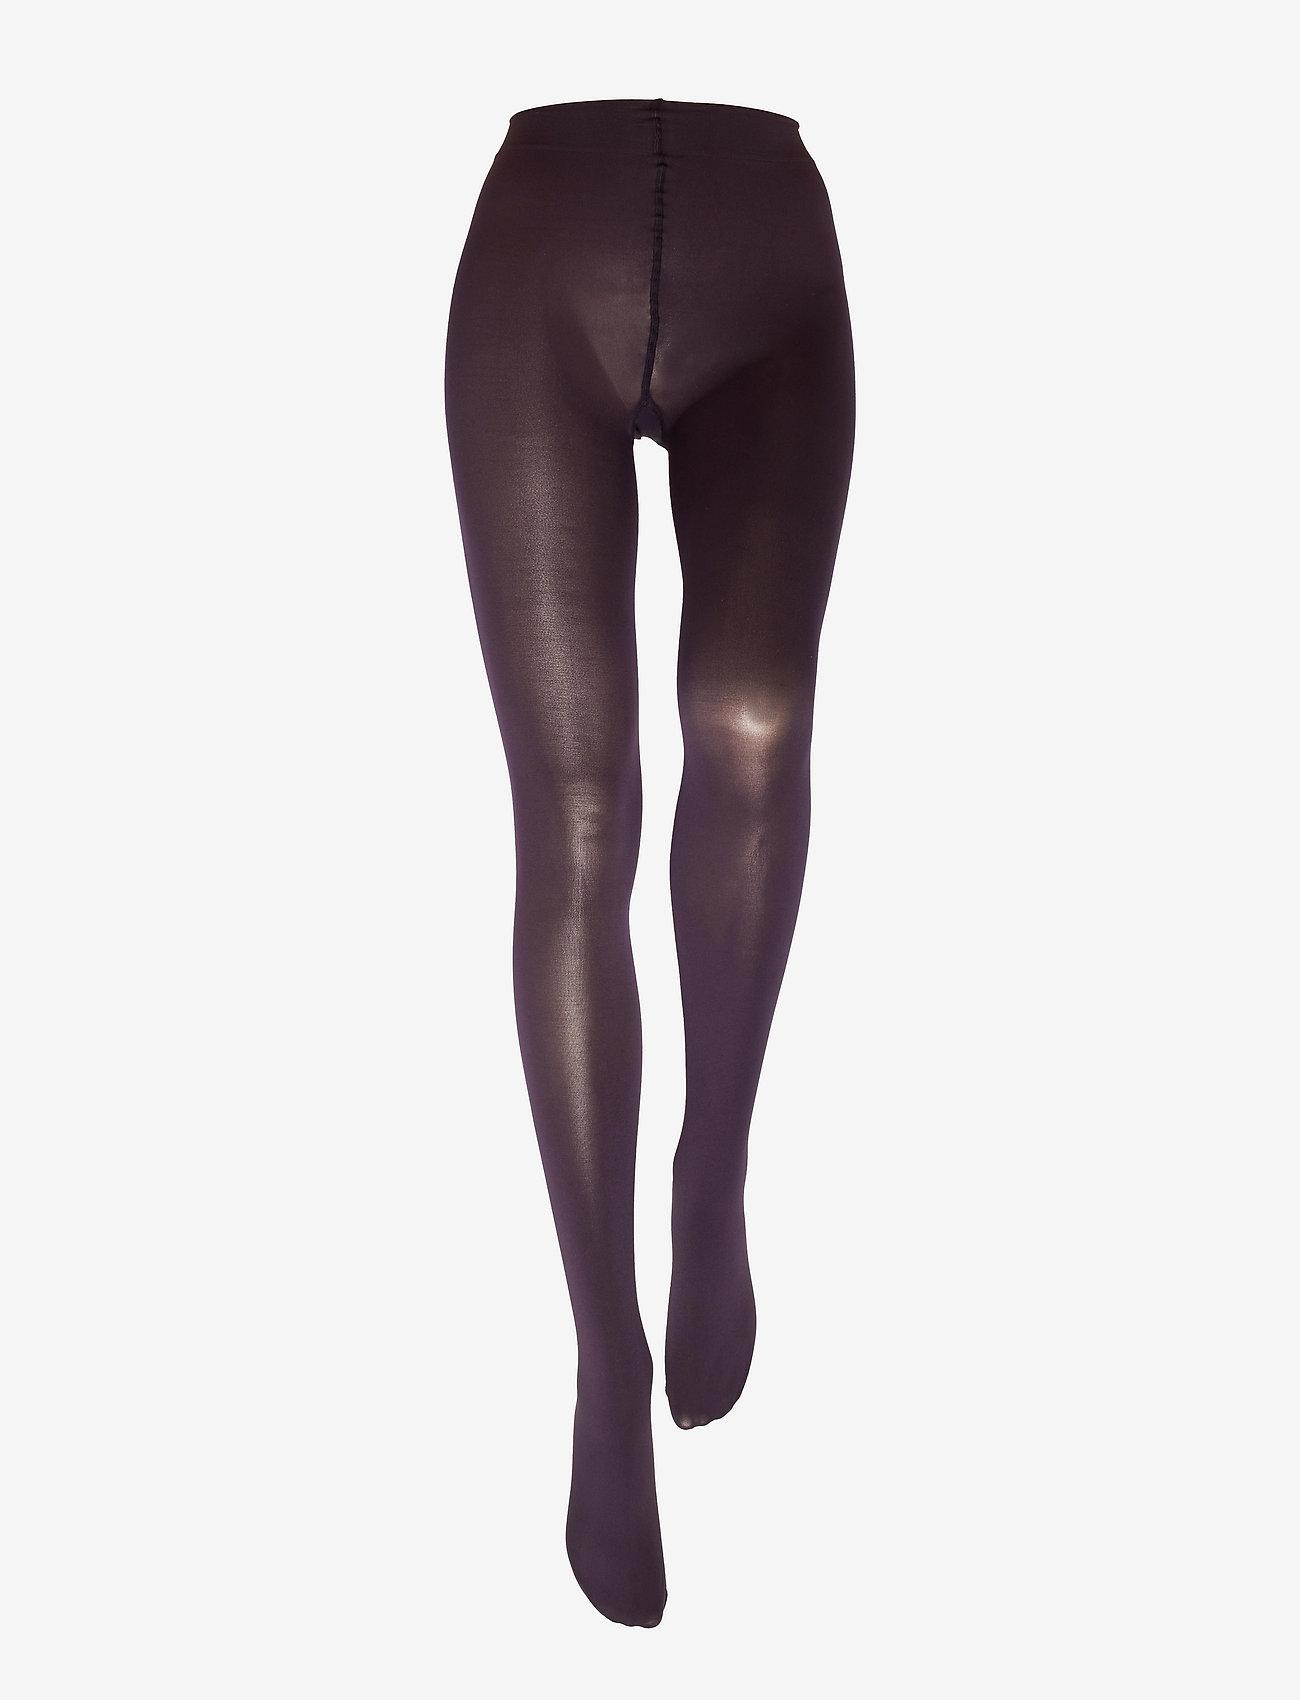 Vogue - Ladies pantyhose den, Opaque 3D 80 den - zeķbikses - dark purple - 1